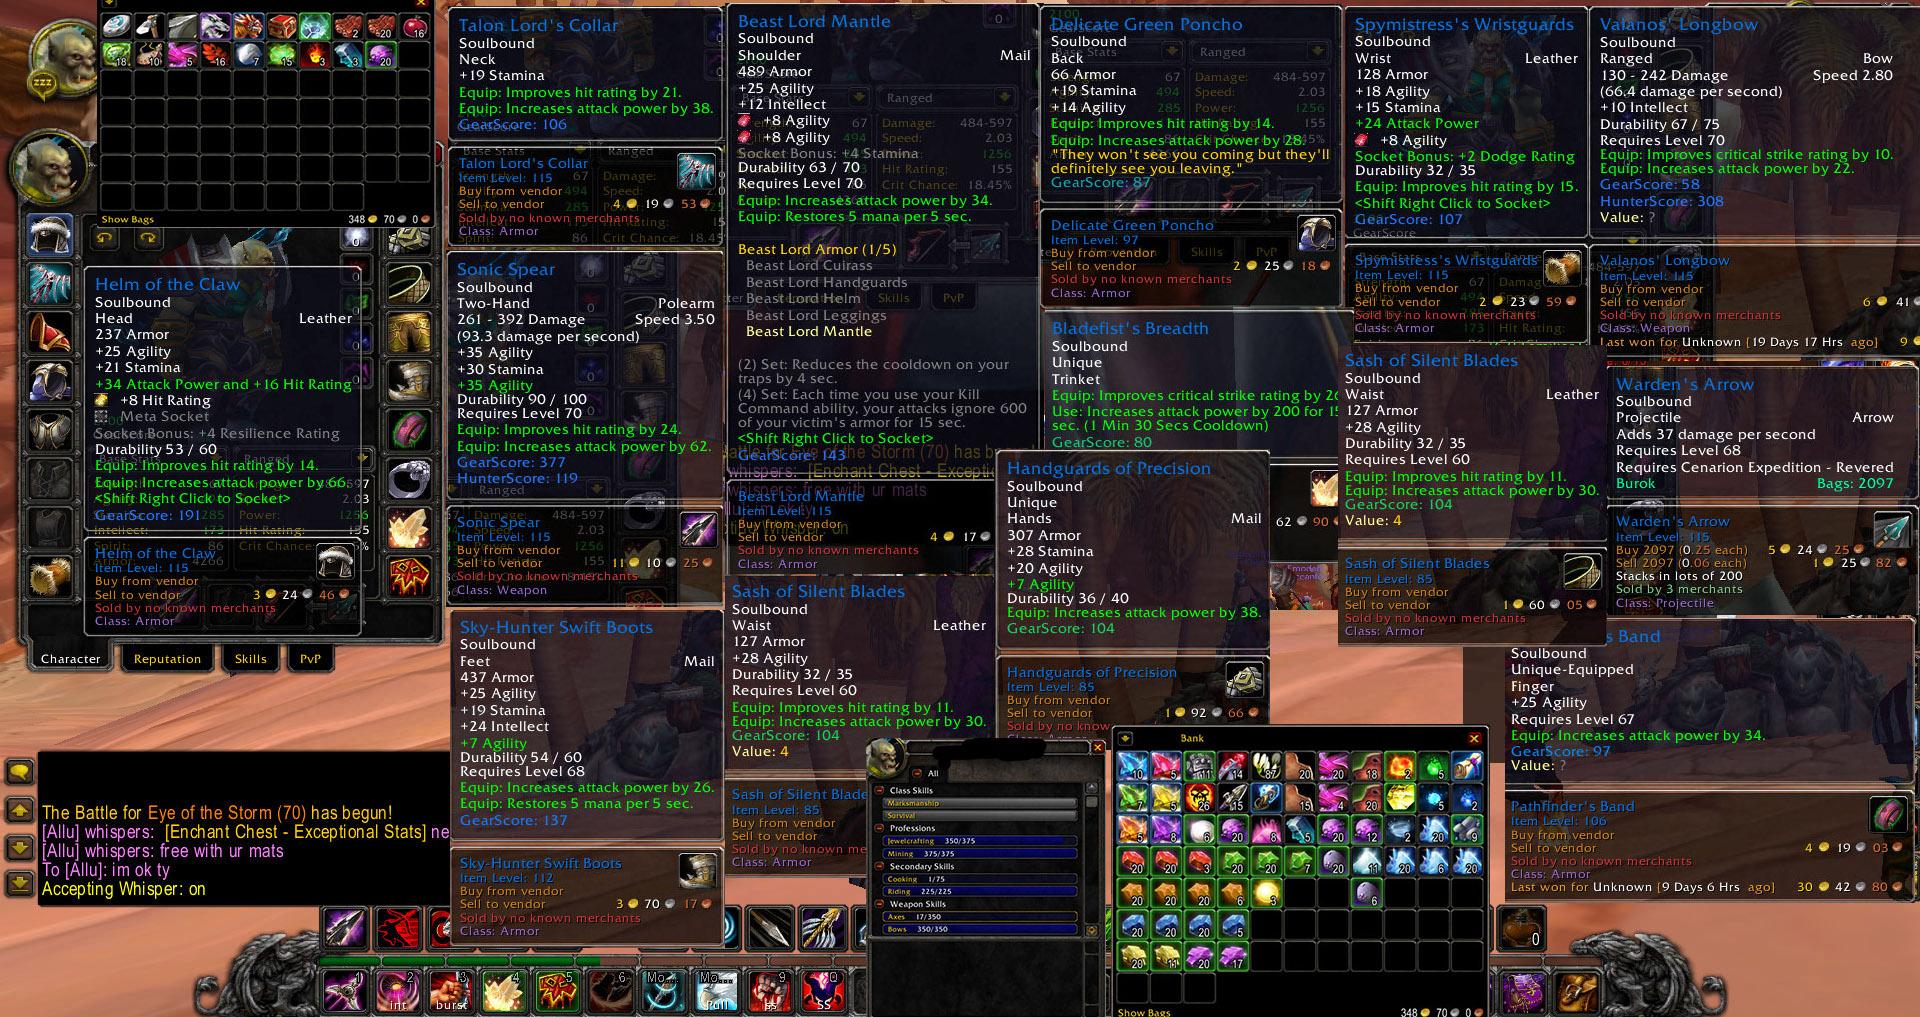 Selling] Account sell - Sunwell - Nightbane - Horde orc 70